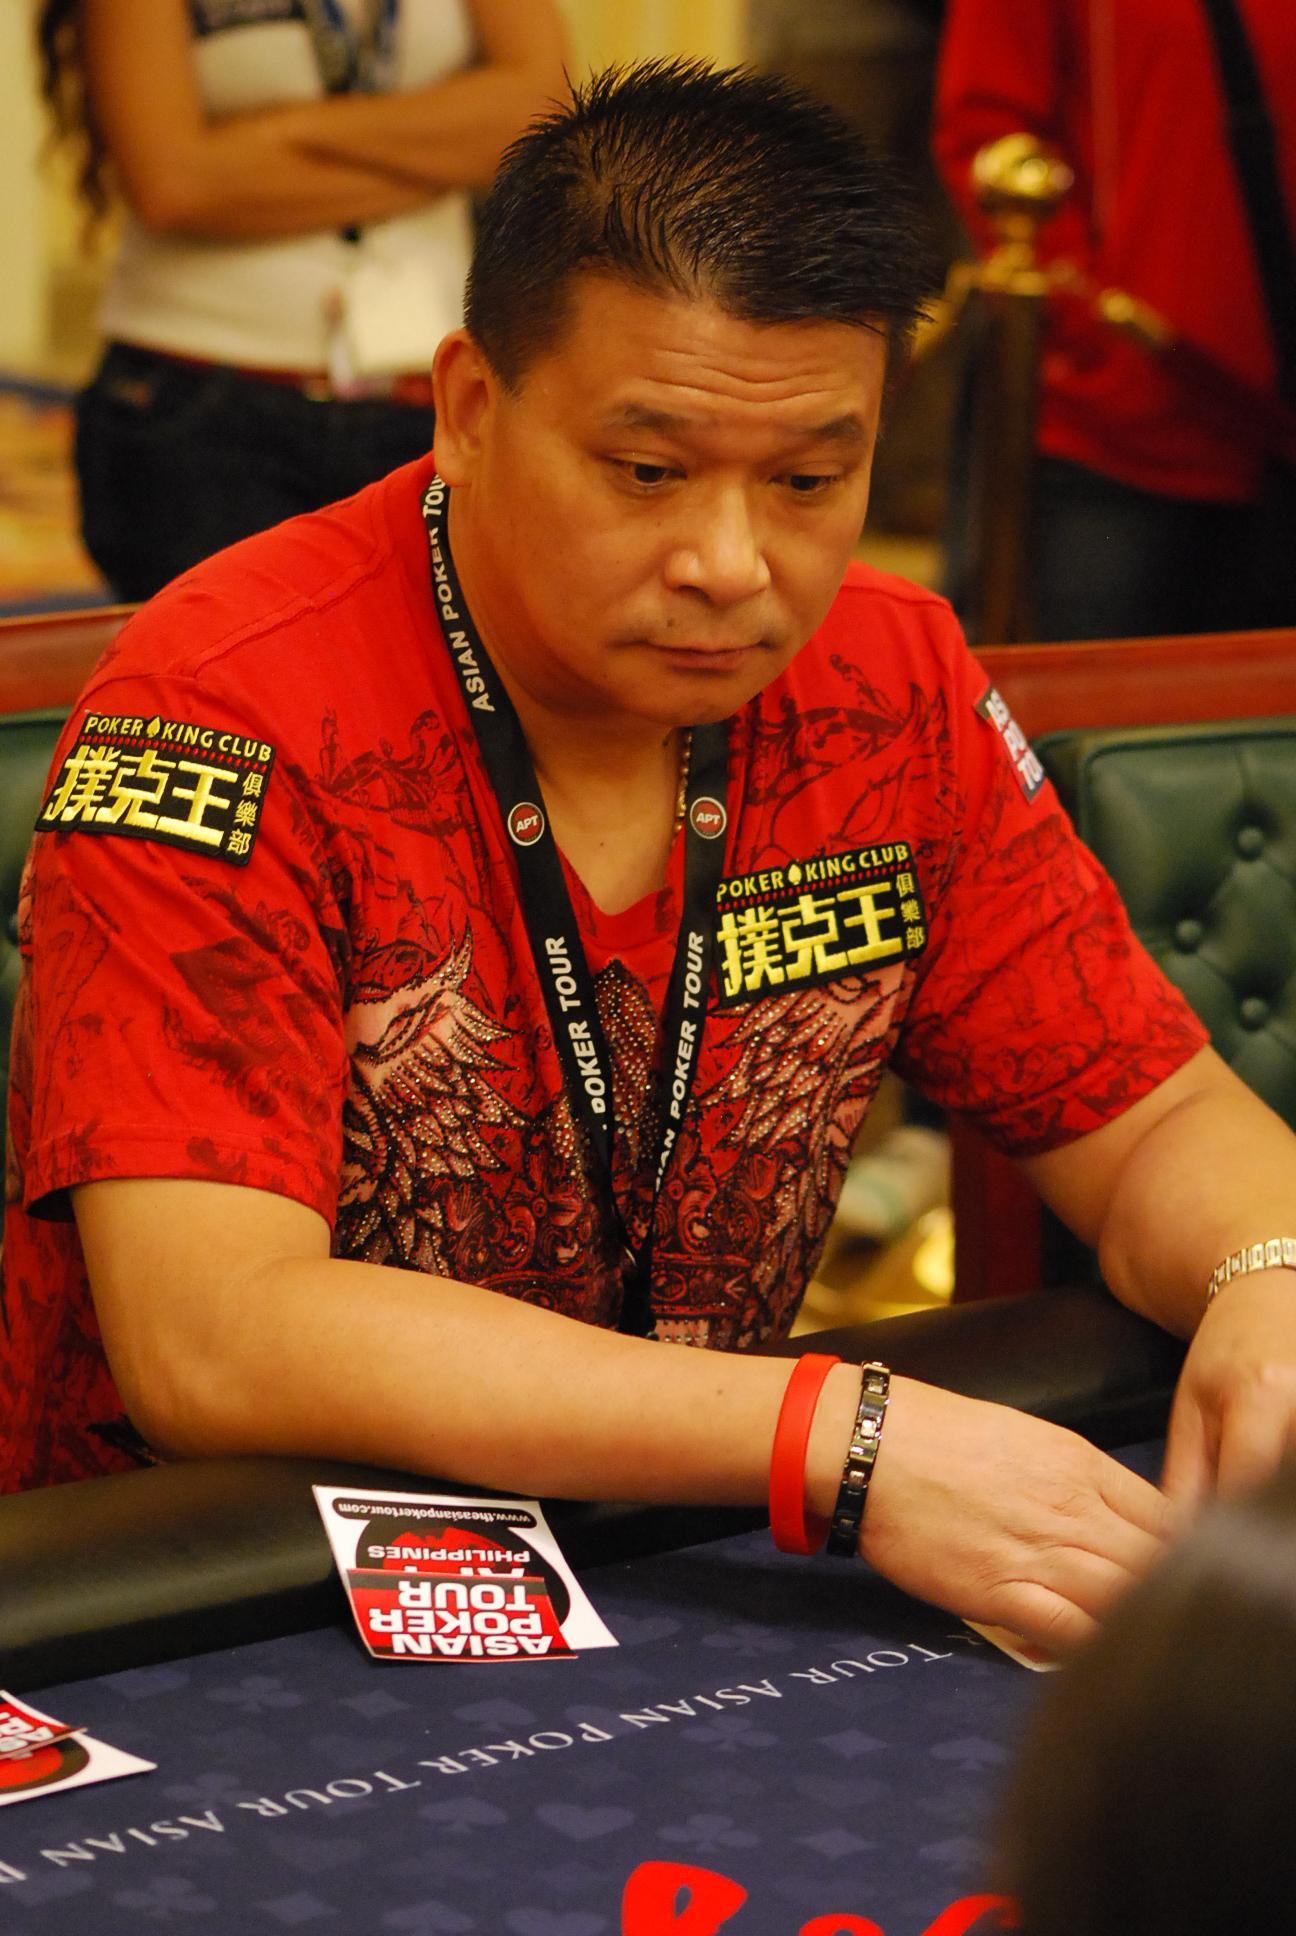 bester pokerspieler der welt